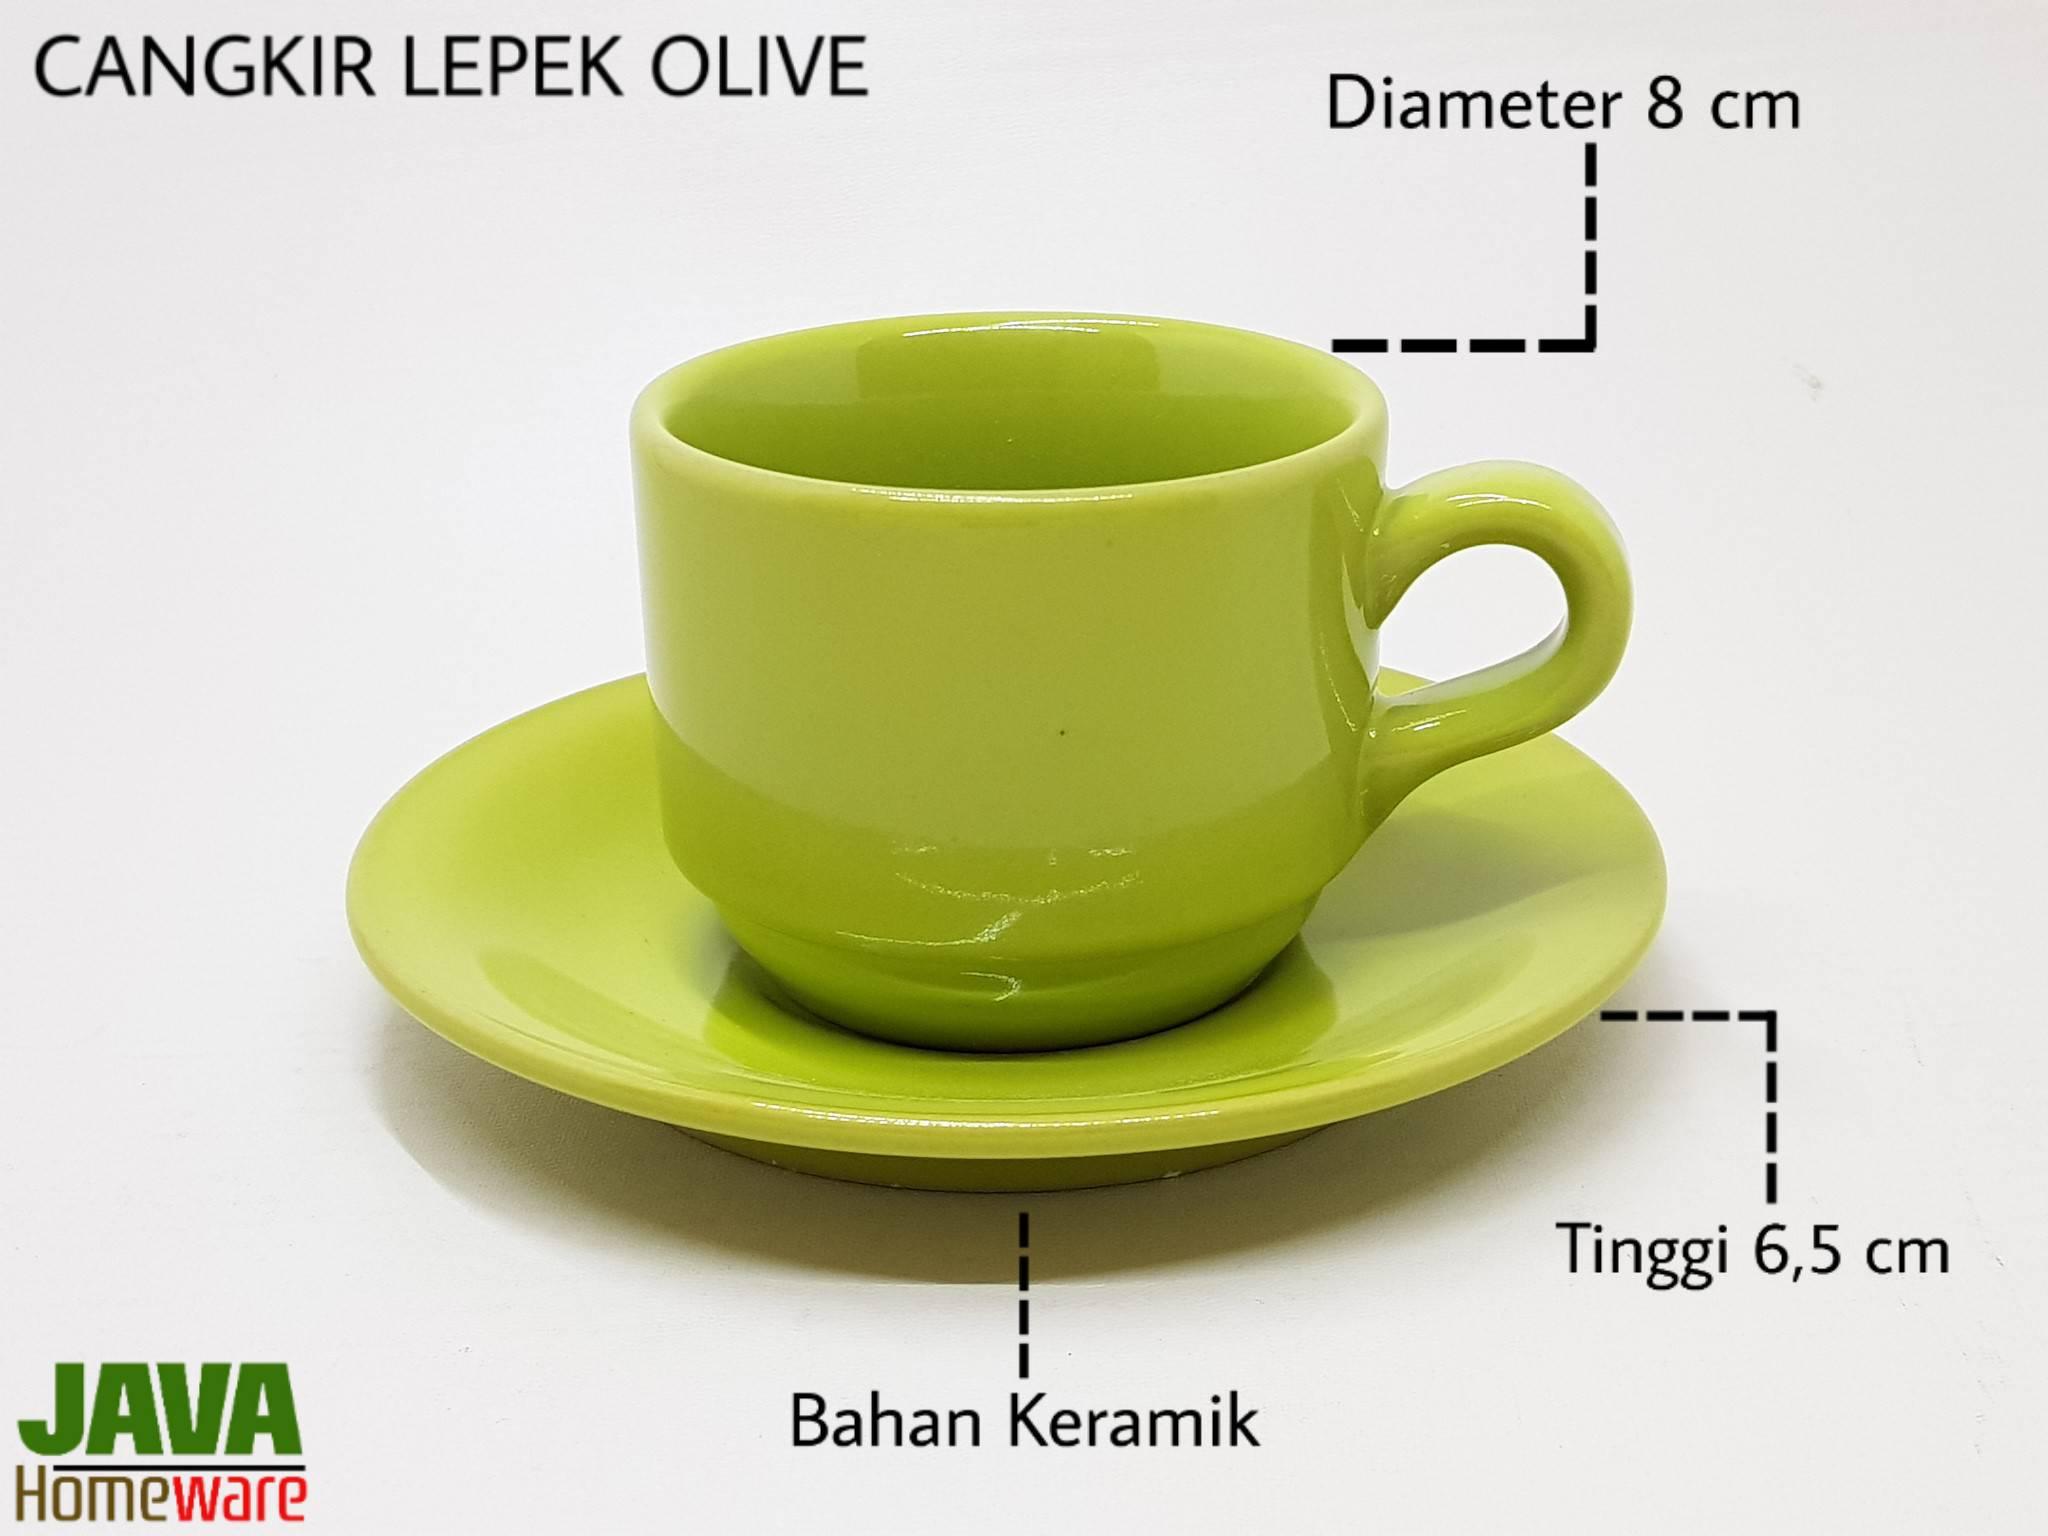 Cangkir Lepek Olive